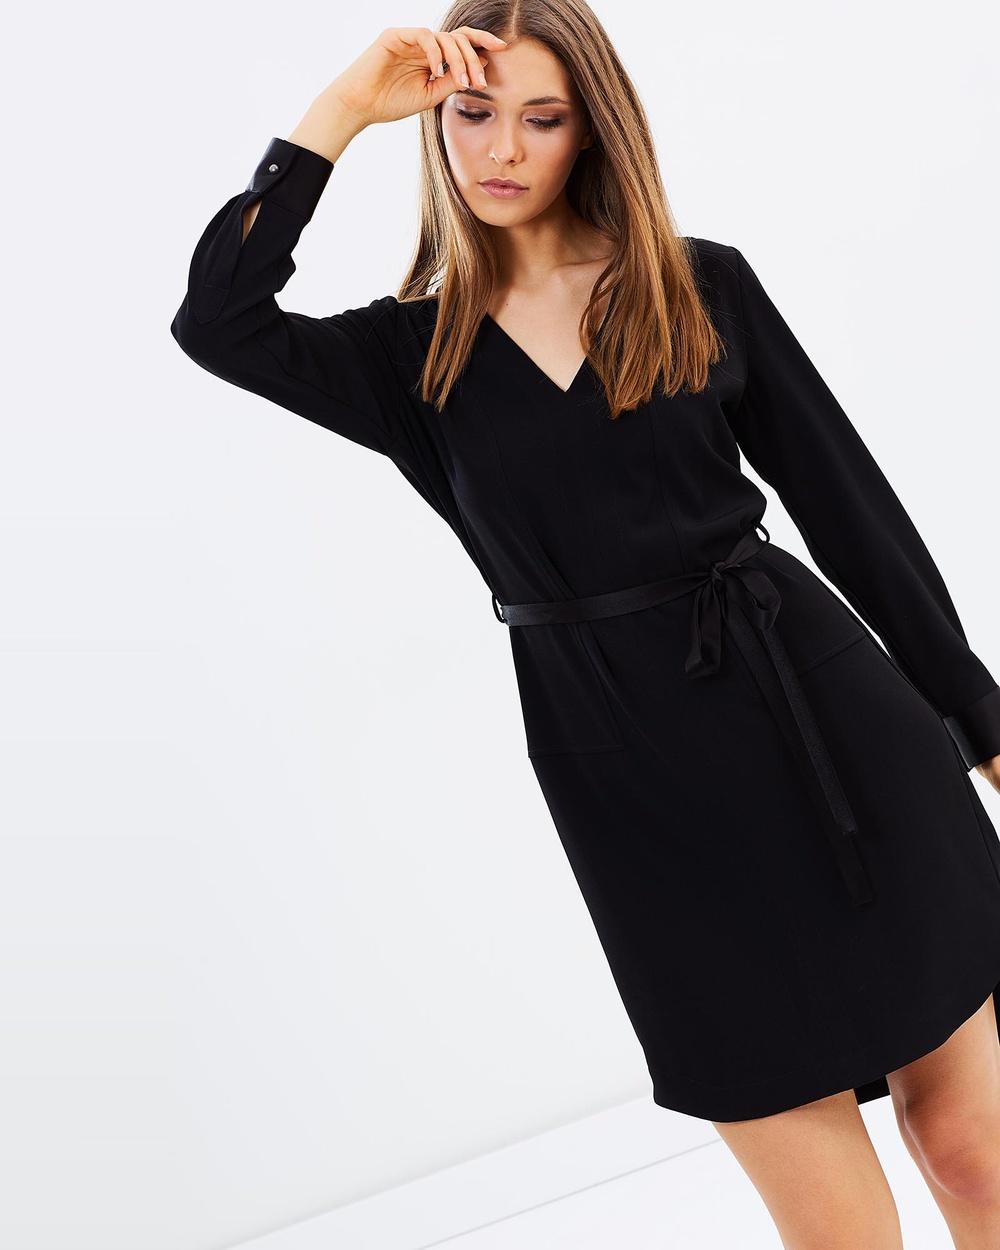 Farage Ingrid Dress Dresses Black Ingrid Dress